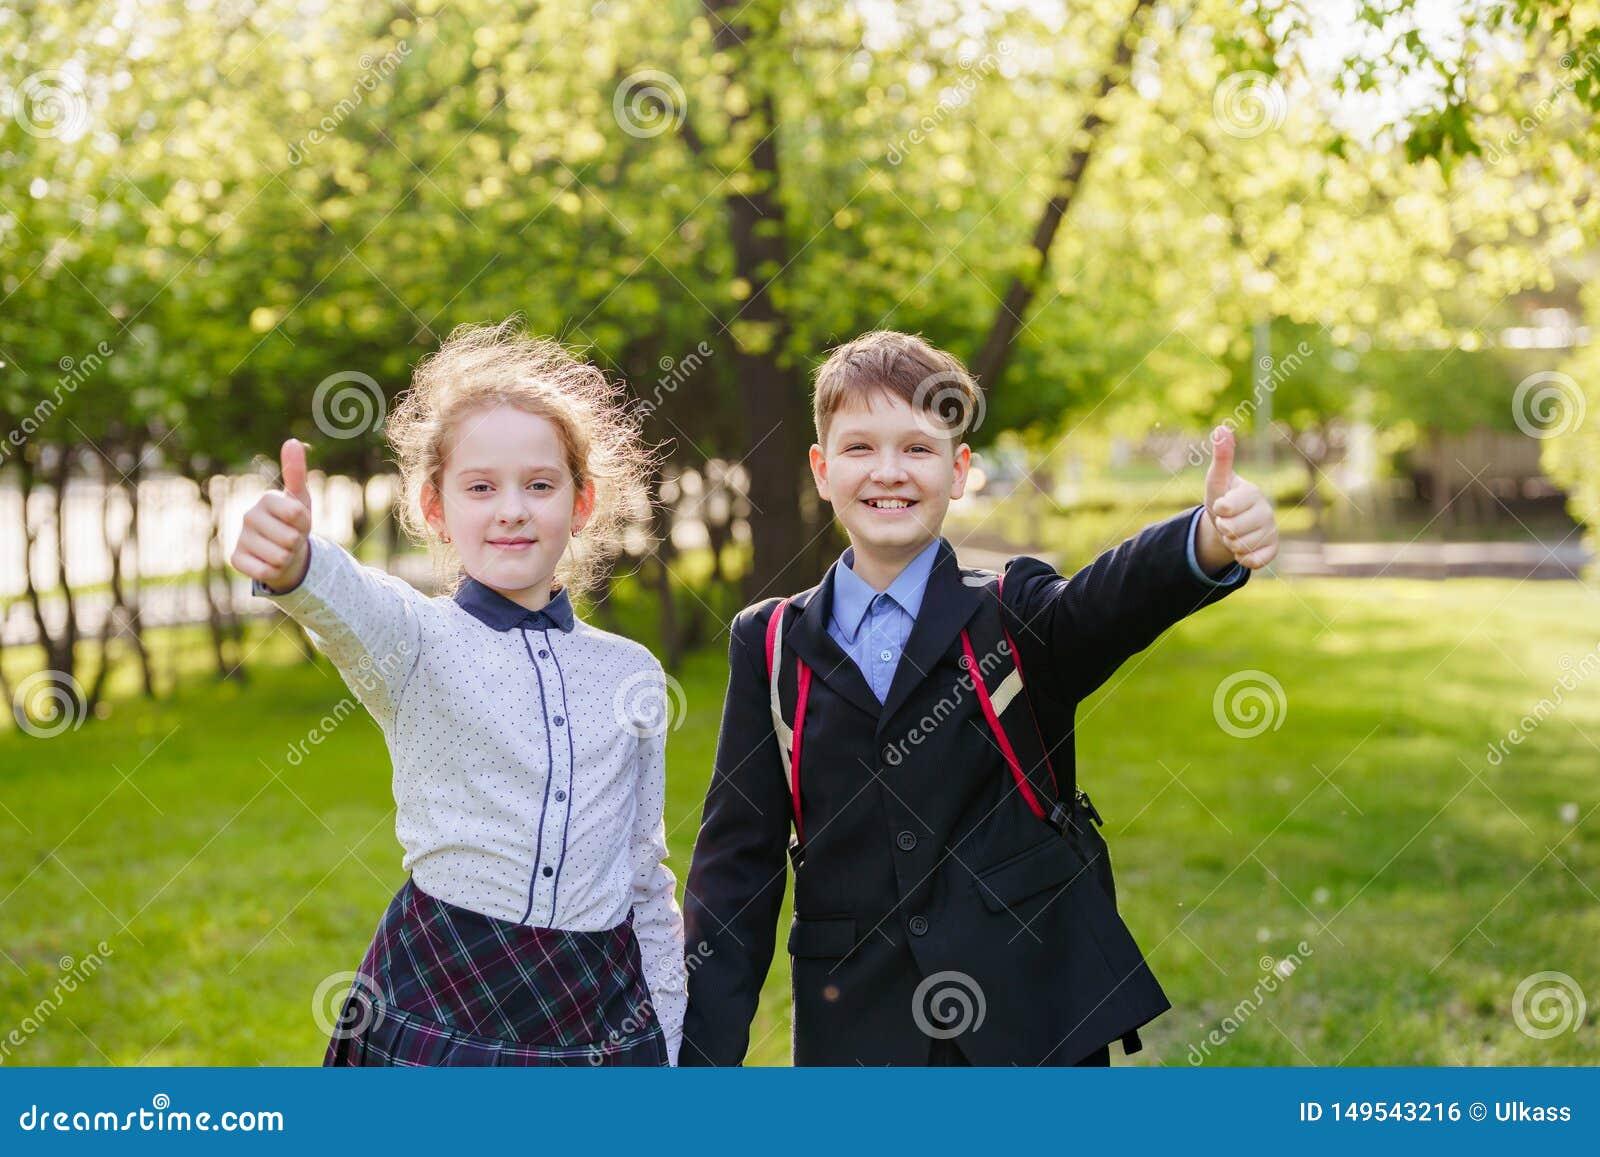 Happy school children giving a thumbs up